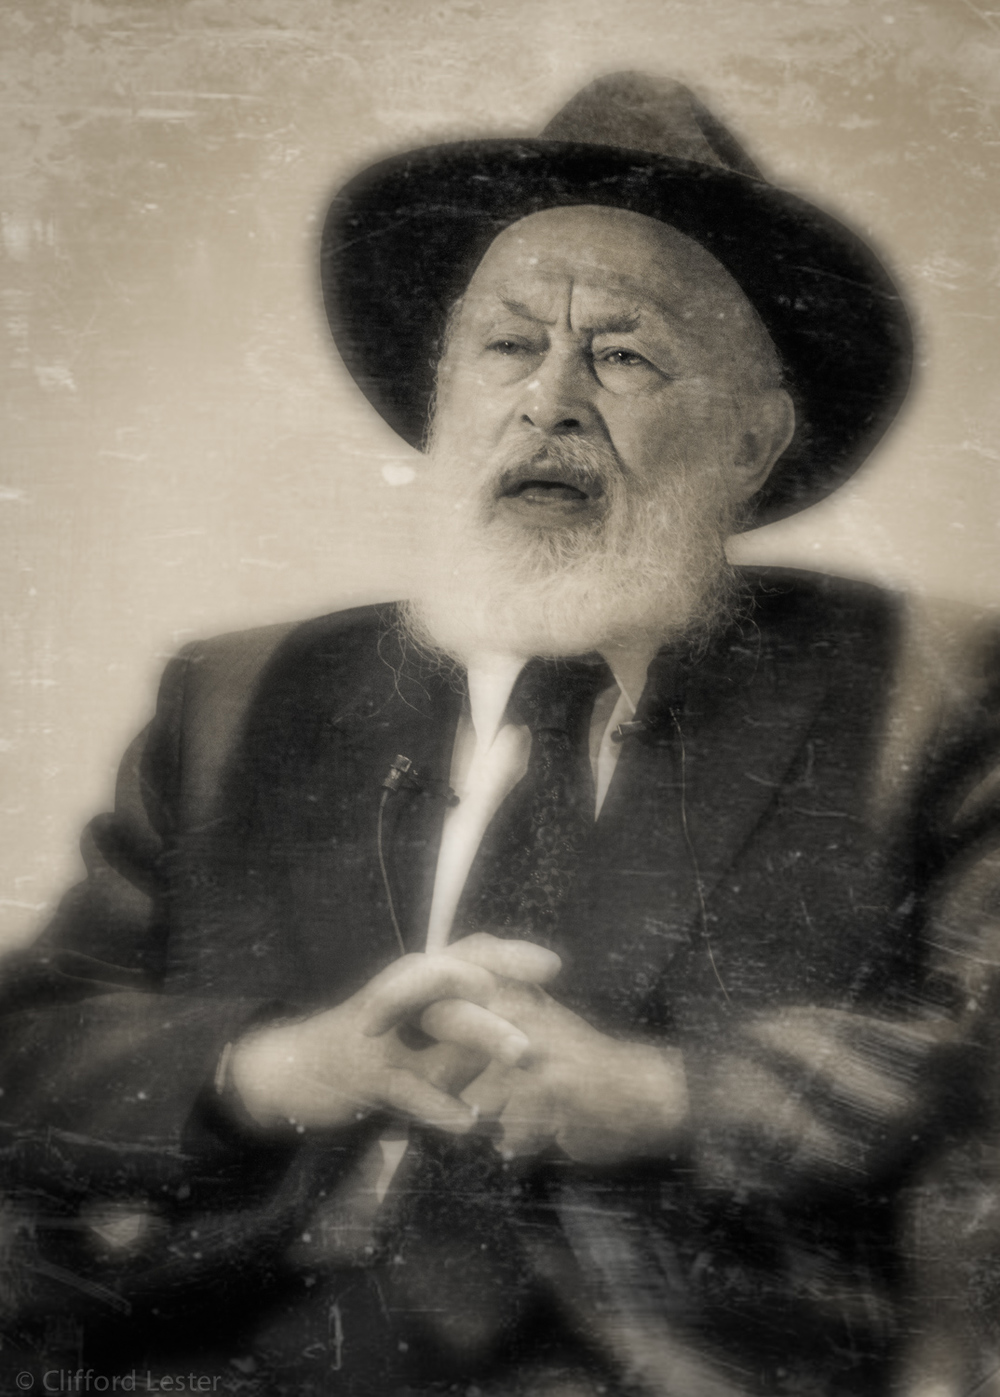 Rabbi Krinsky